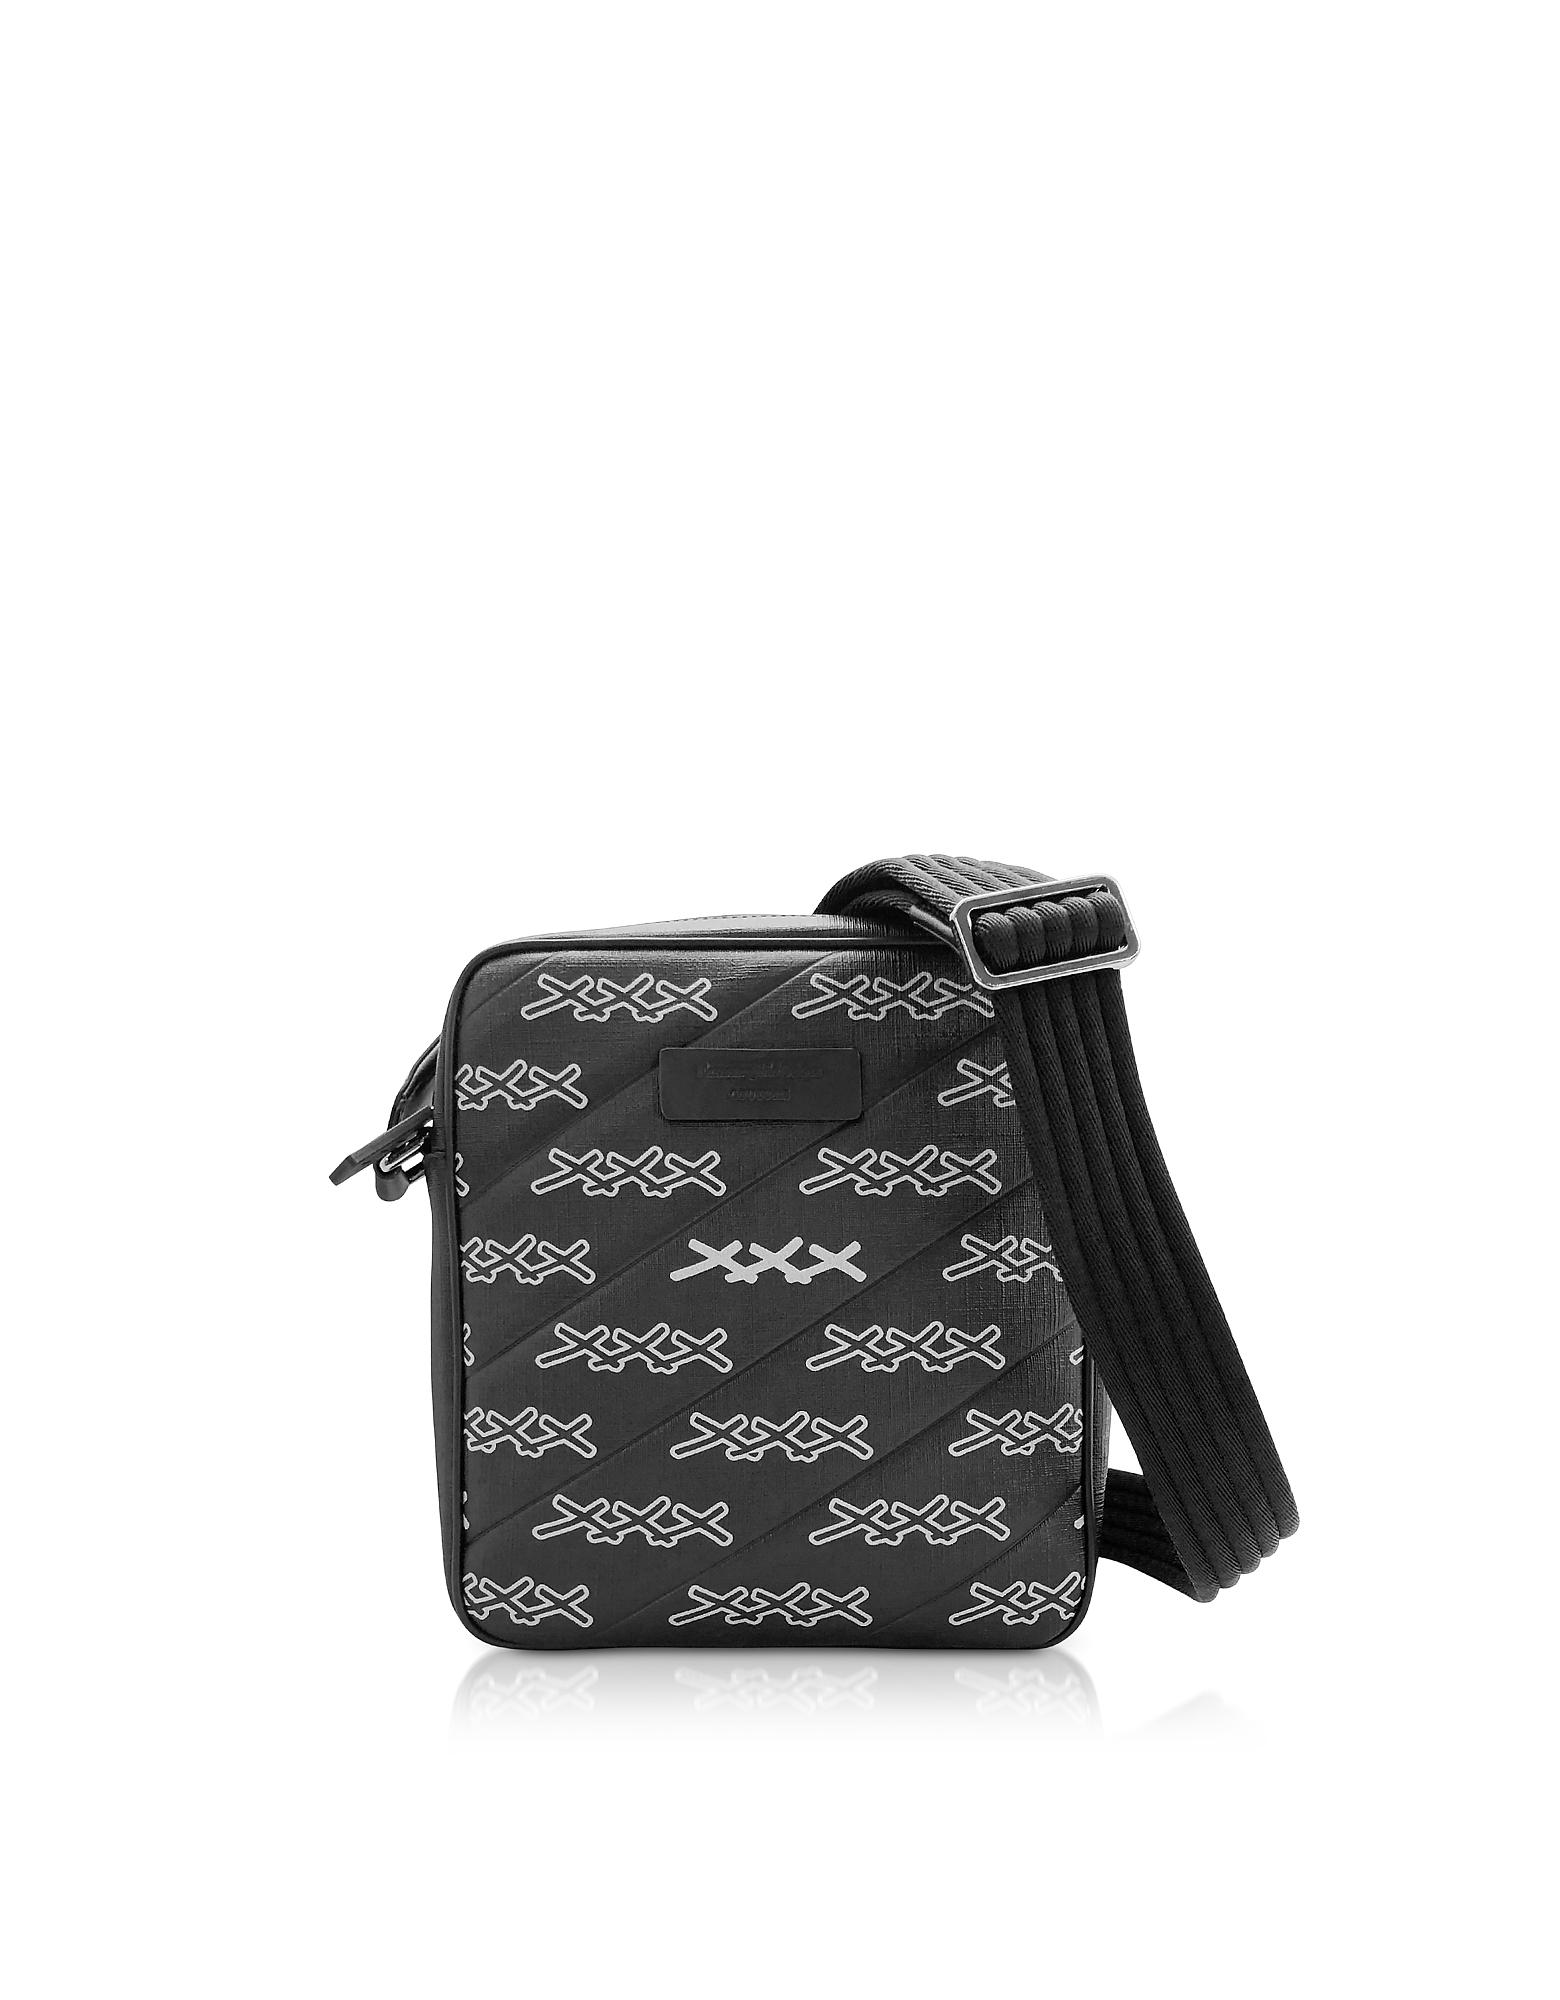 Ermenegildo Zegna Crossbody BLACK COATED CANVAS SIGNATURE CROSSBODY BAG